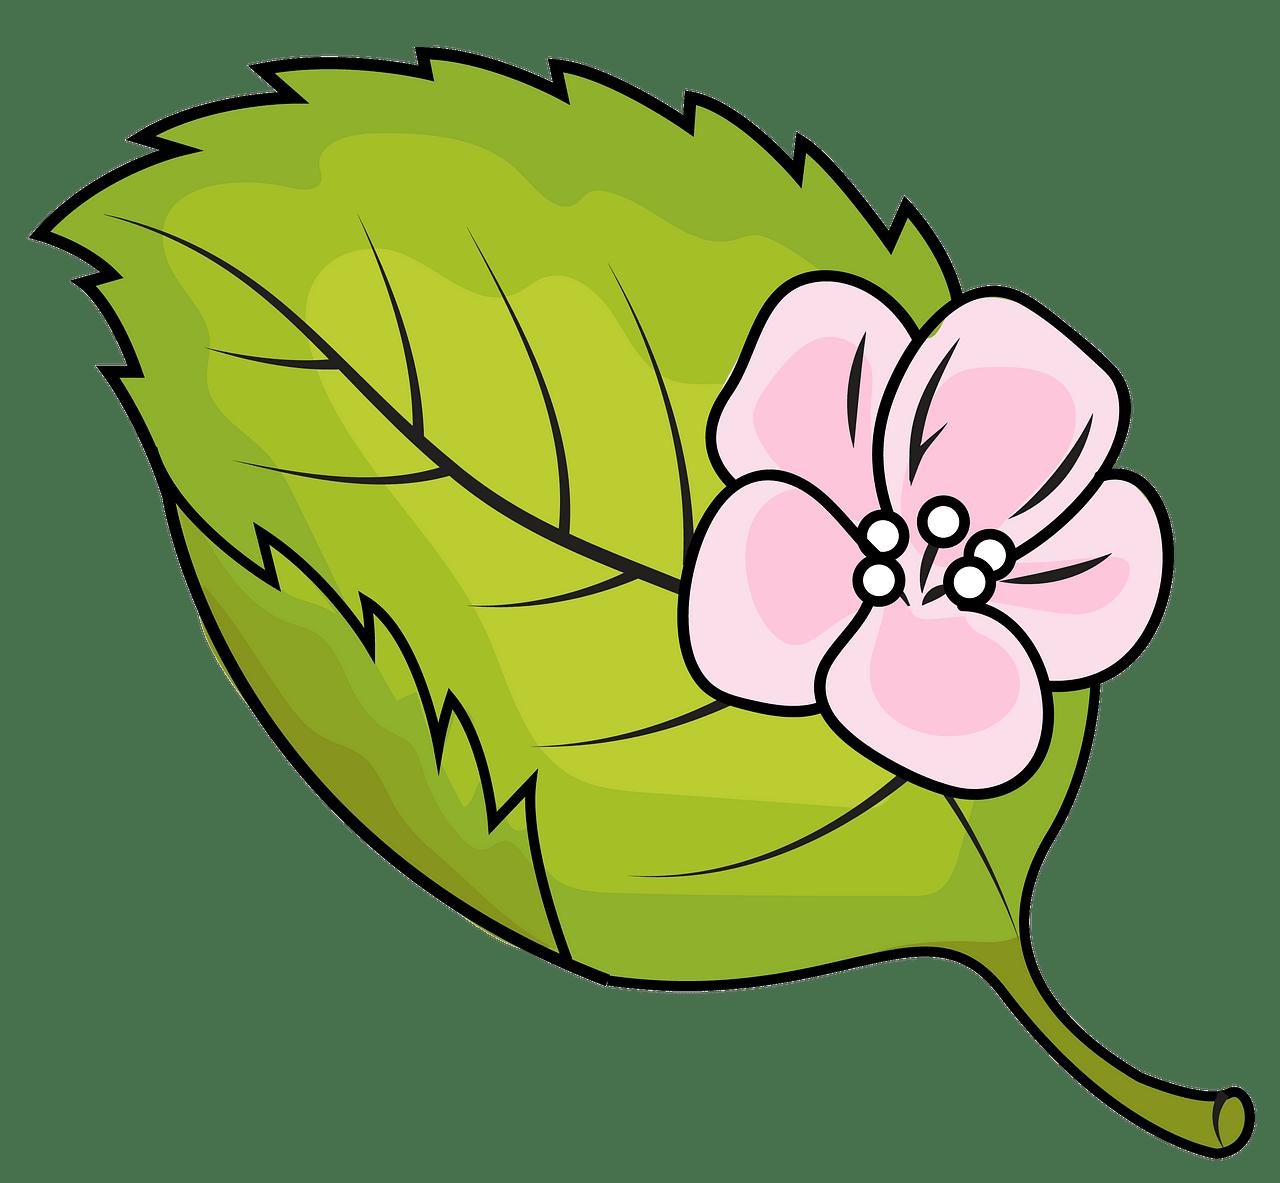 Apple leaf clipart. Free download..